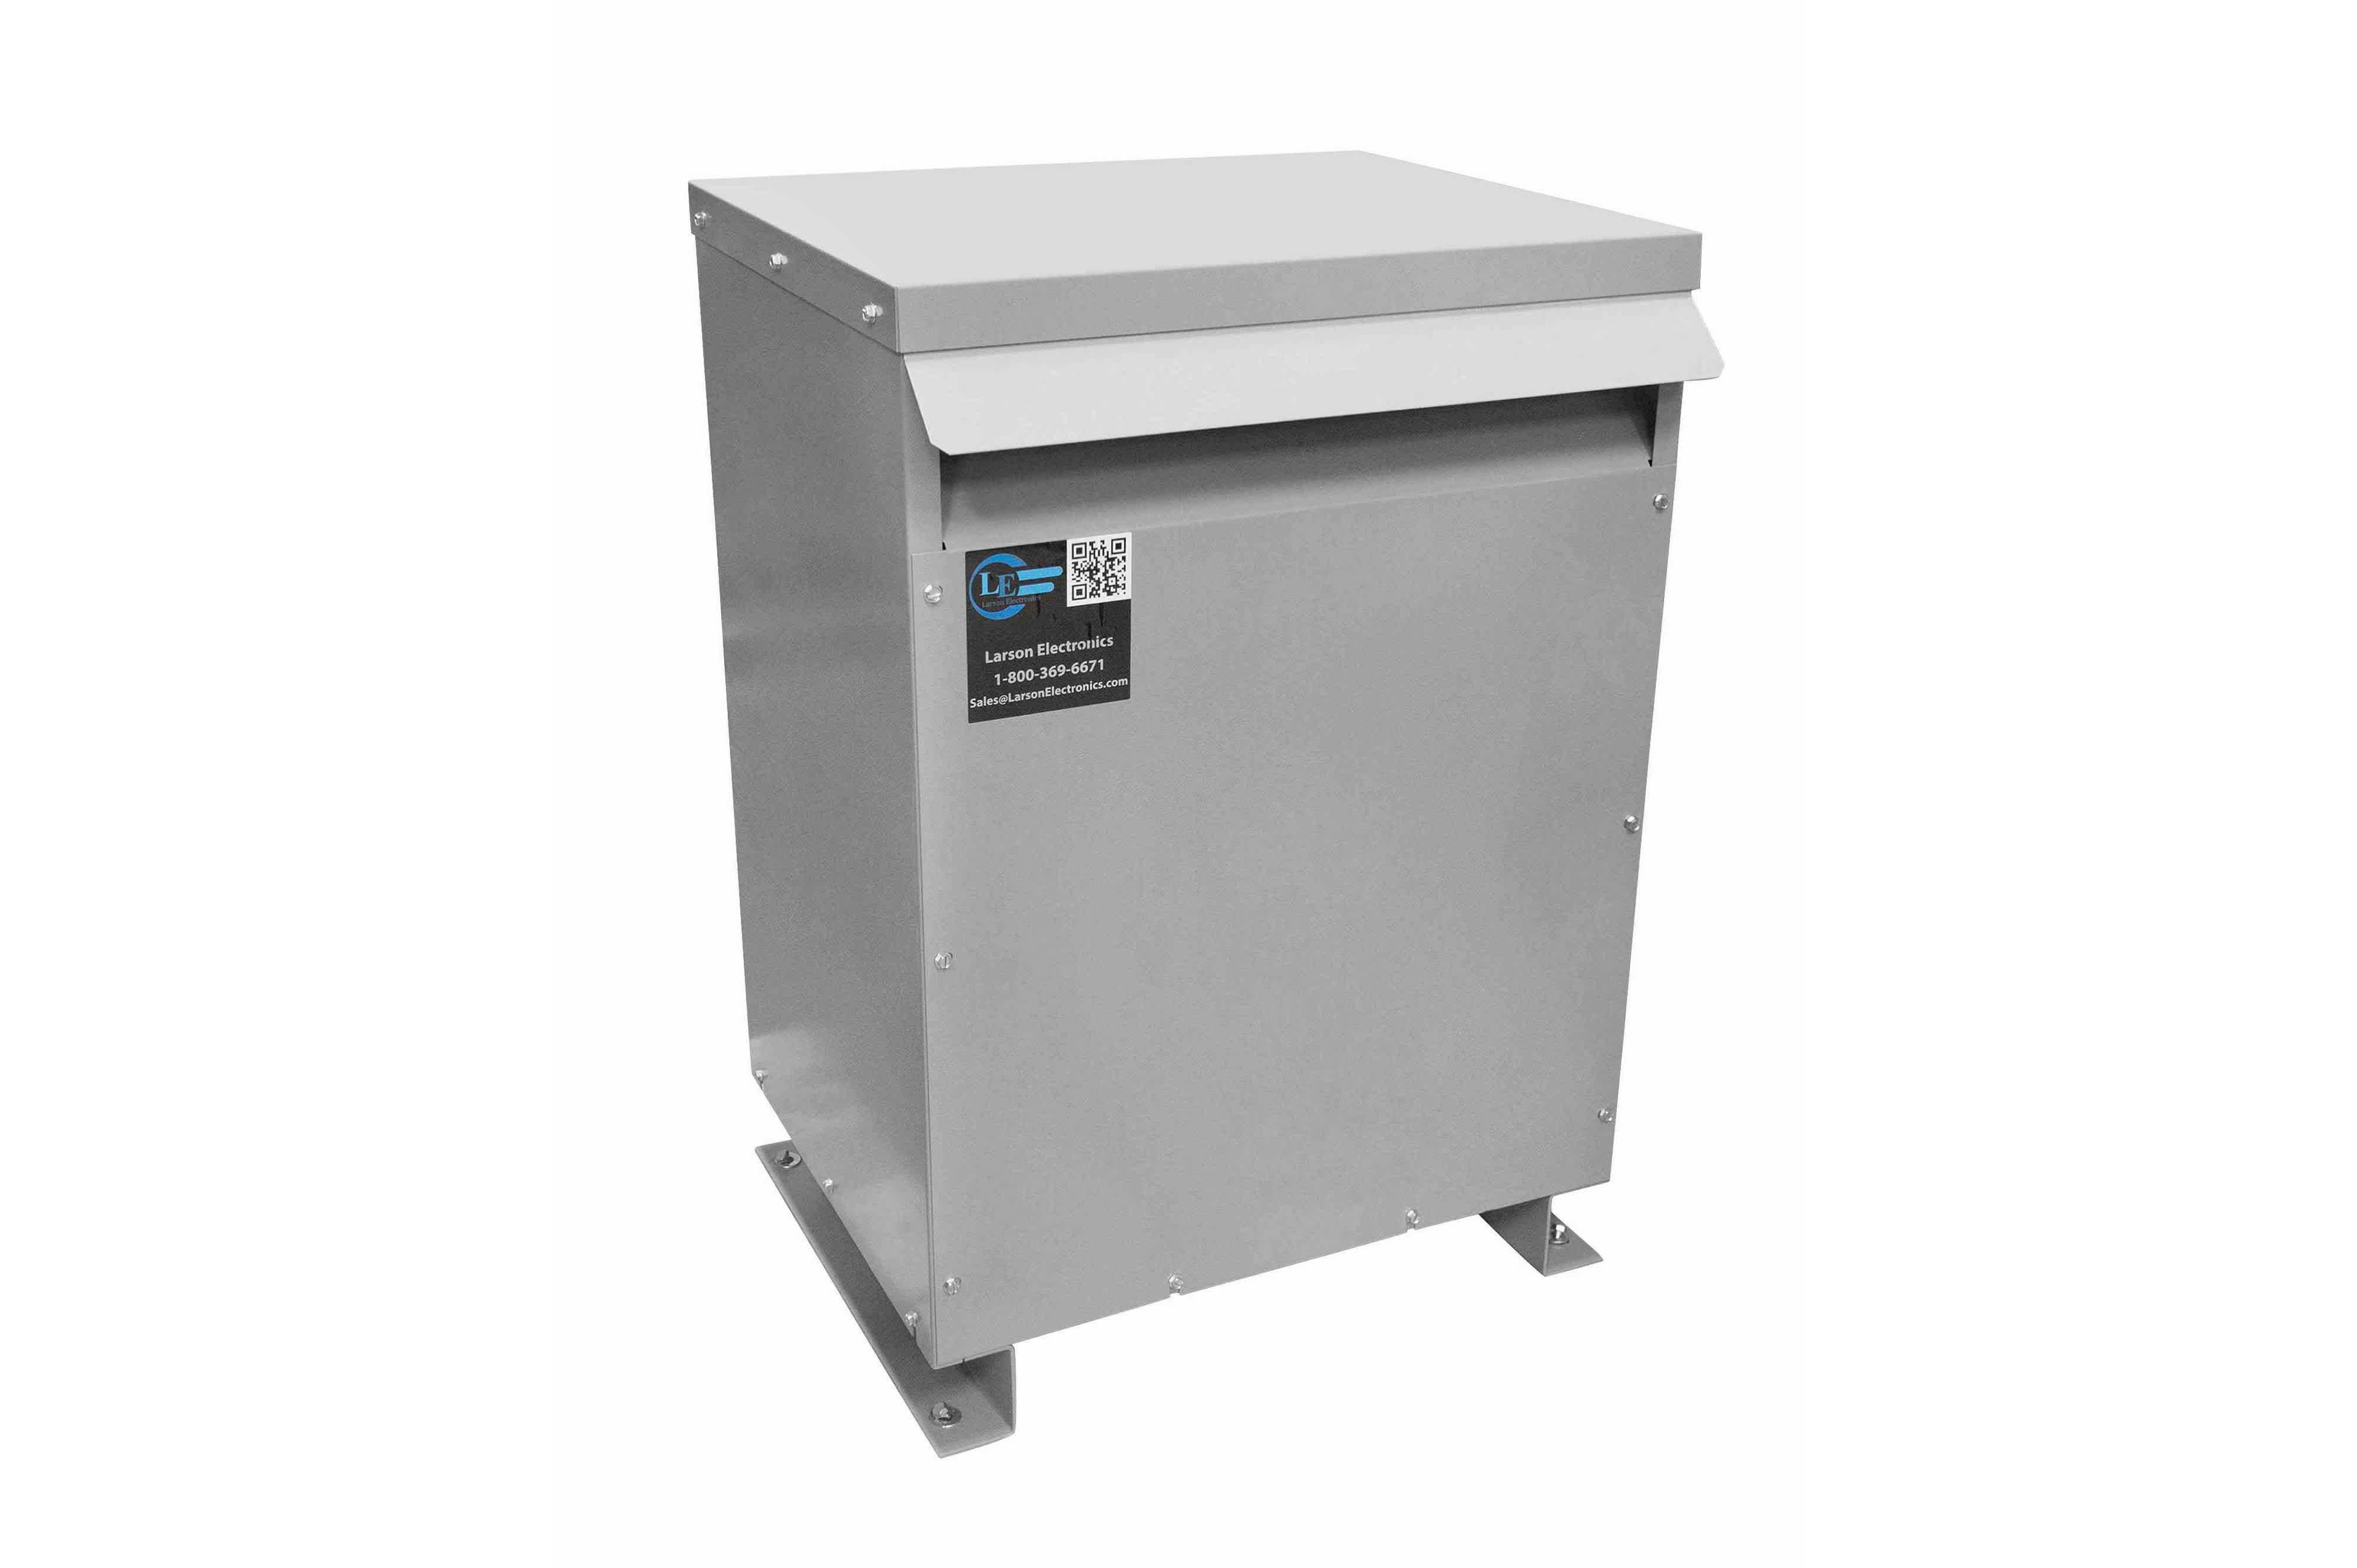 38 kVA 3PH DOE Transformer, 208V Delta Primary, 480Y/277 Wye-N Secondary, N3R, Ventilated, 60 Hz